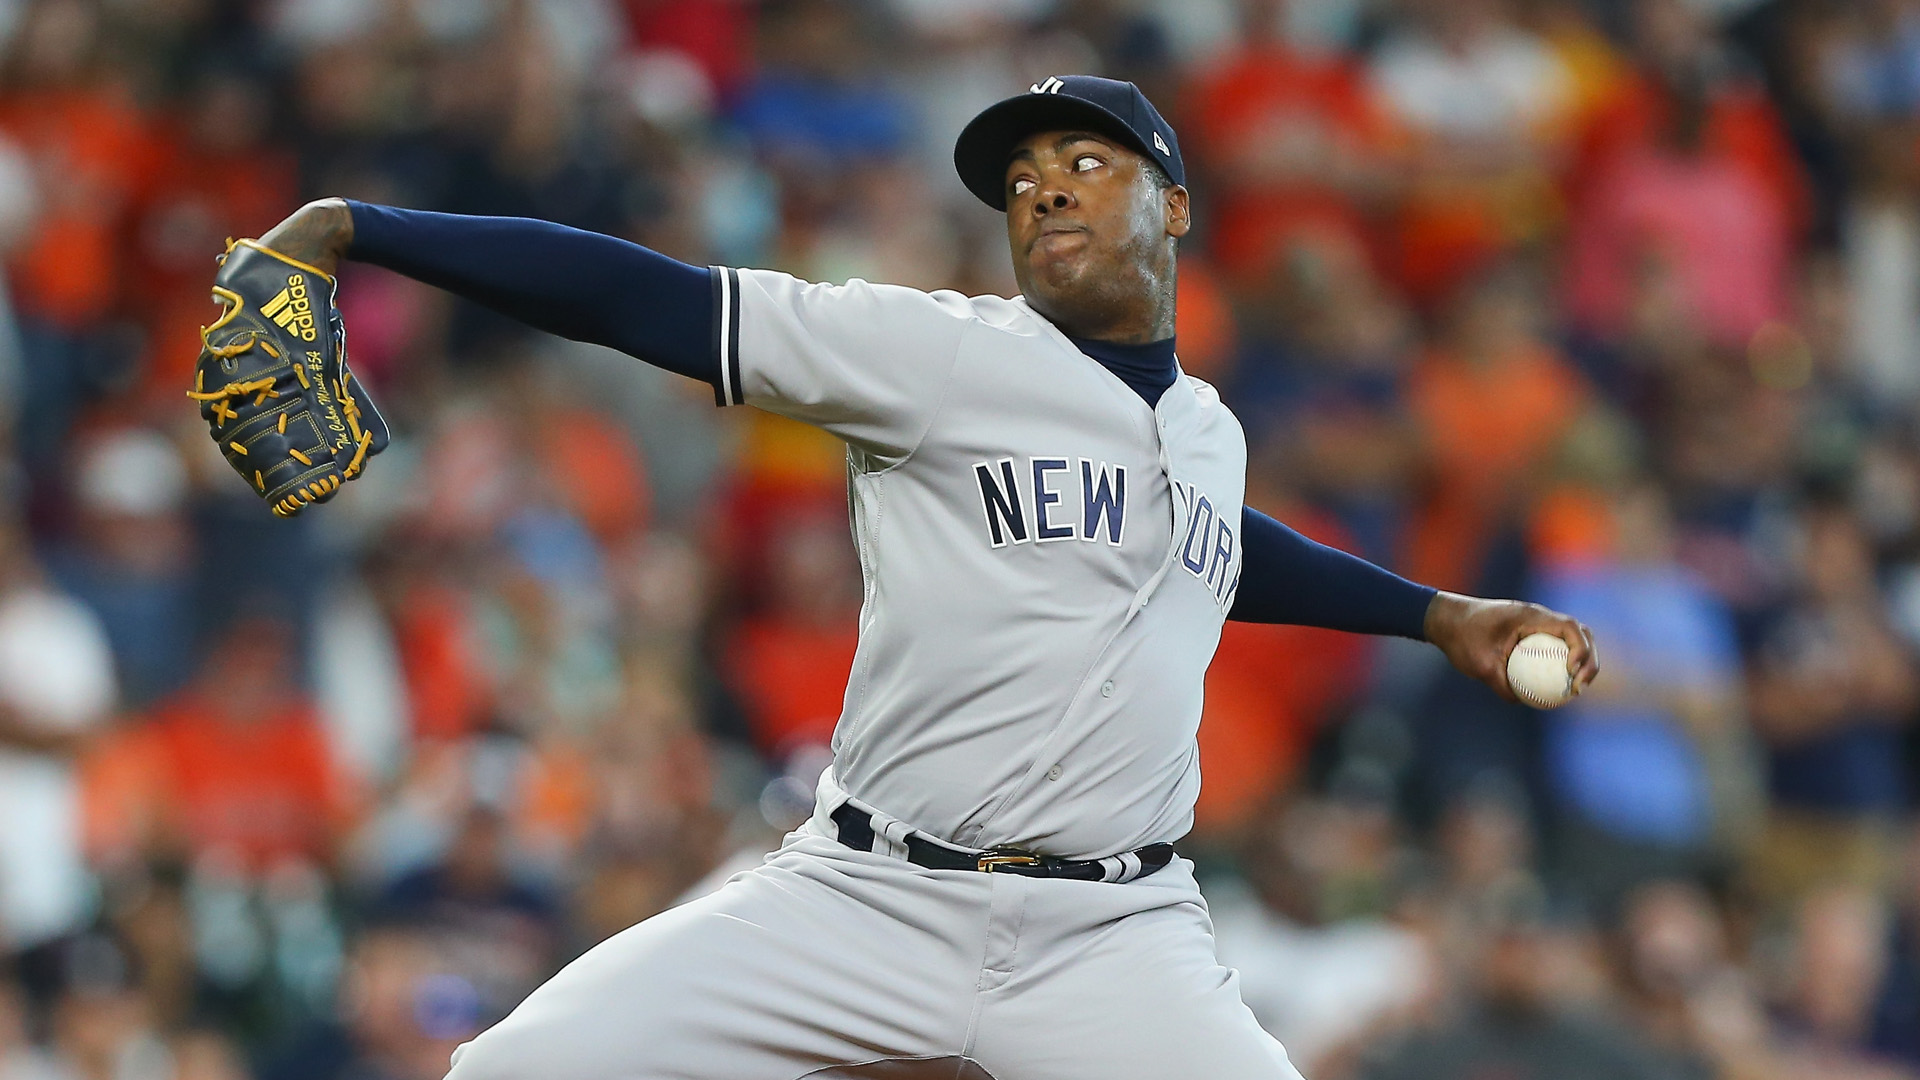 Yankees' Chapman injures hand